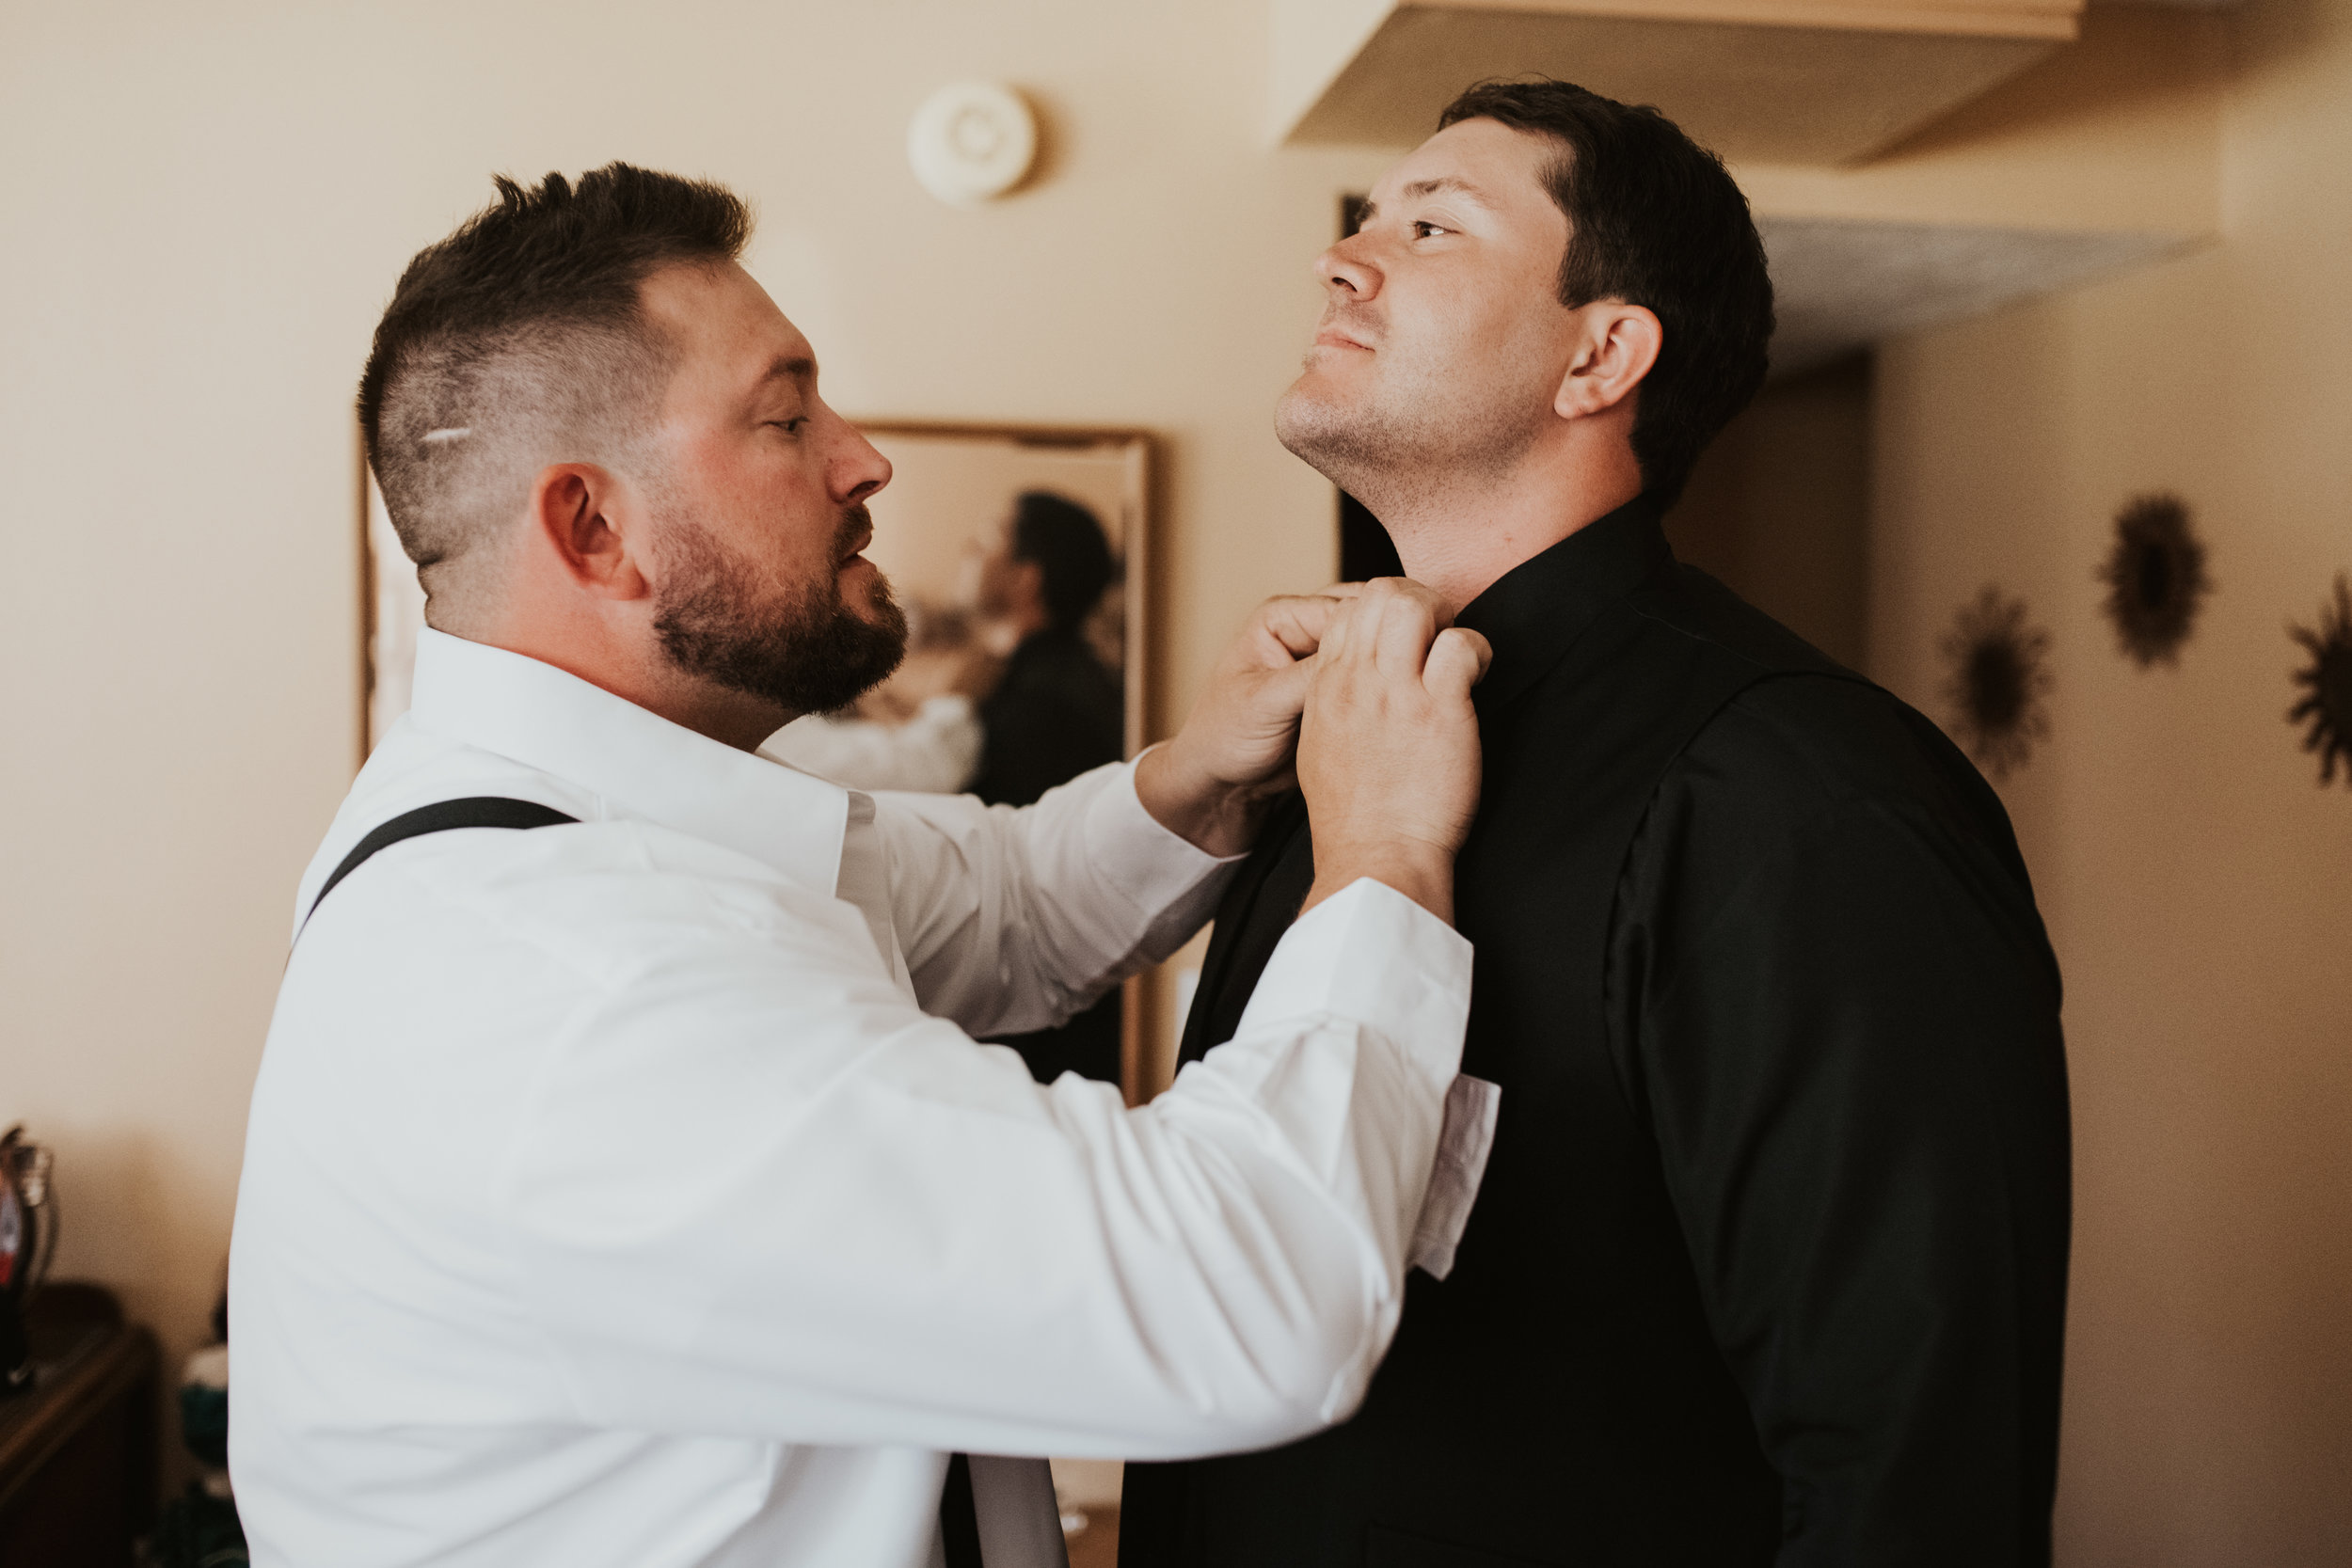 groomsmen hanging out getting ready spokane wedding